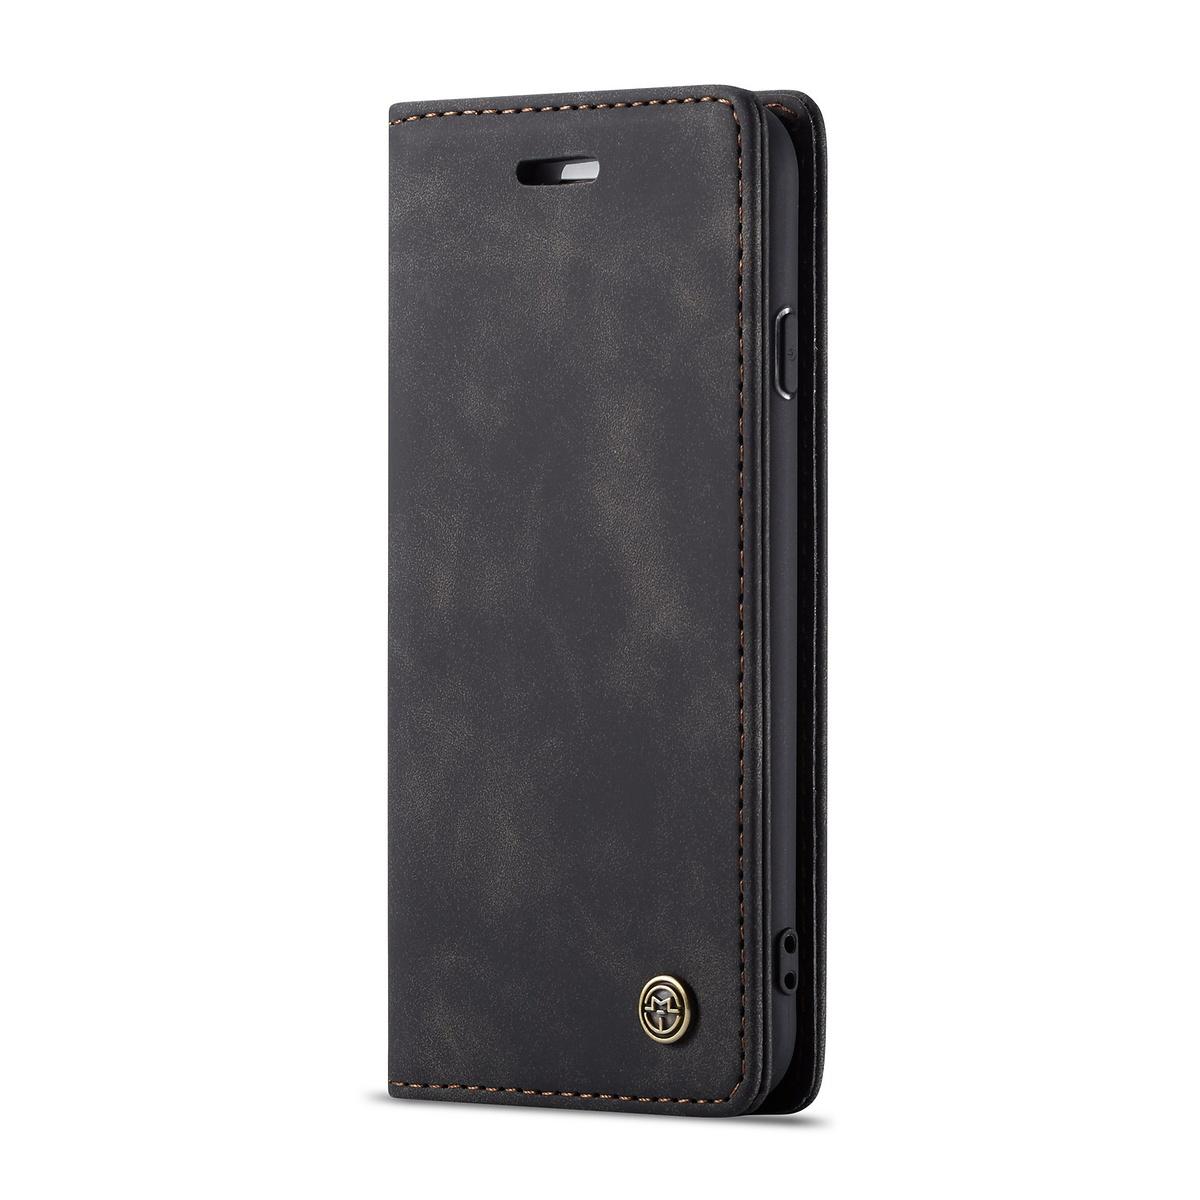 CaseMe plånboksfodral till iPhone 8/7, svart